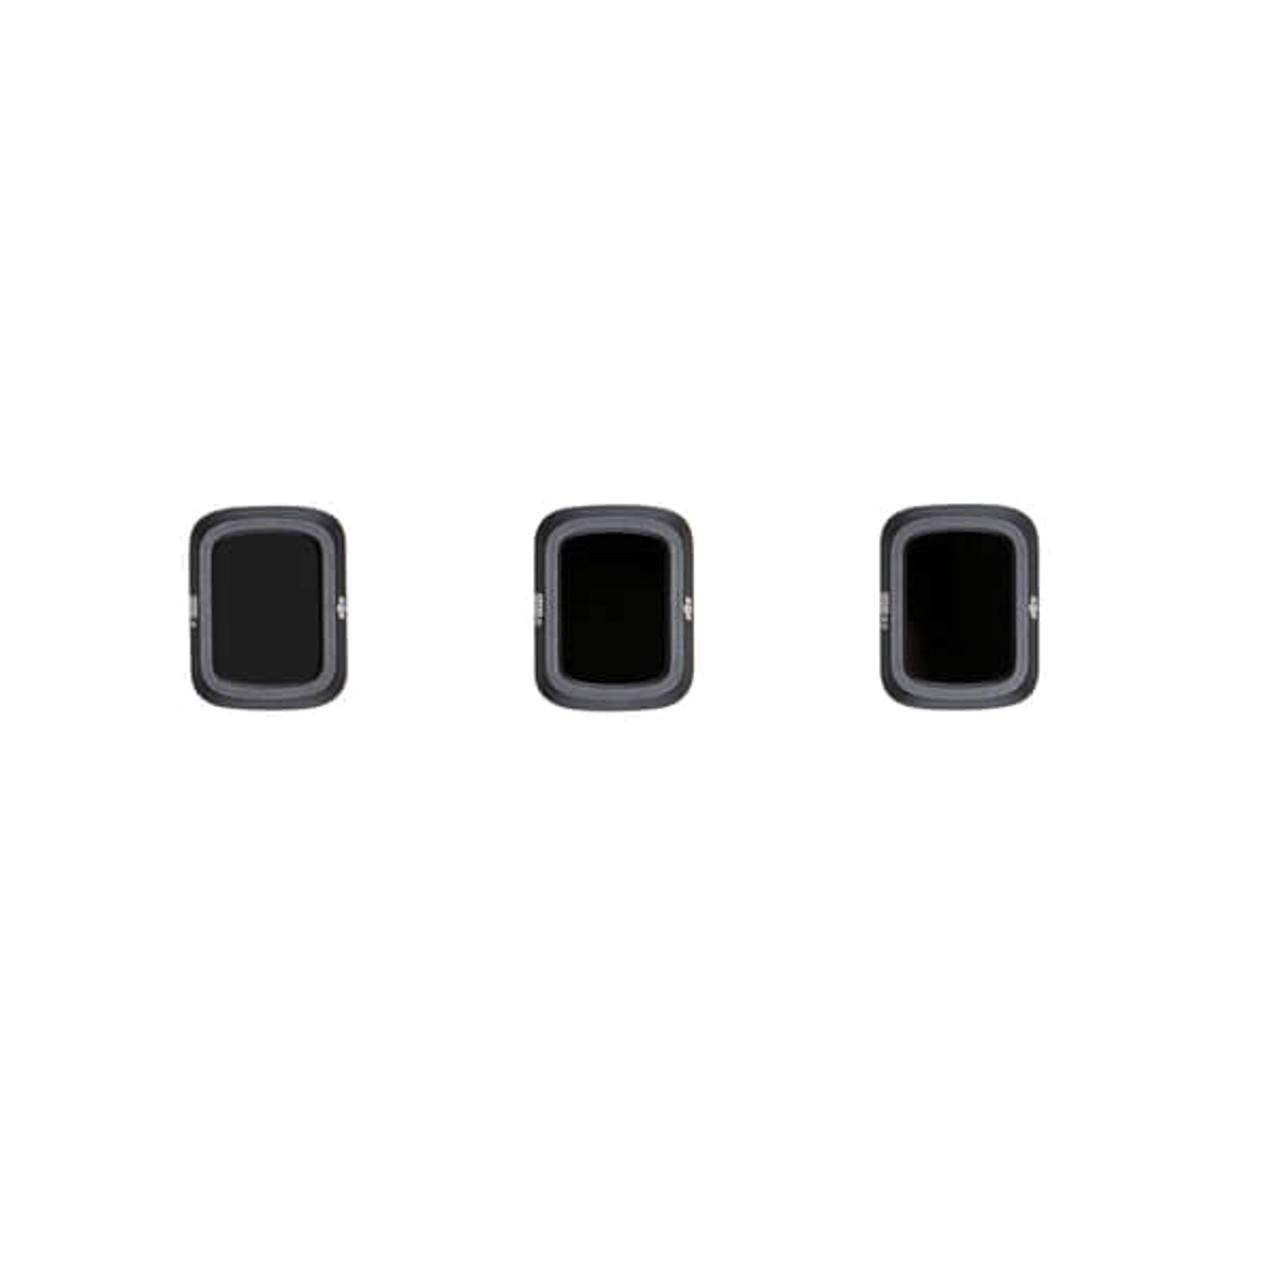 DJI Mavic Air 2 ND Filters Set (ND4/8/32)